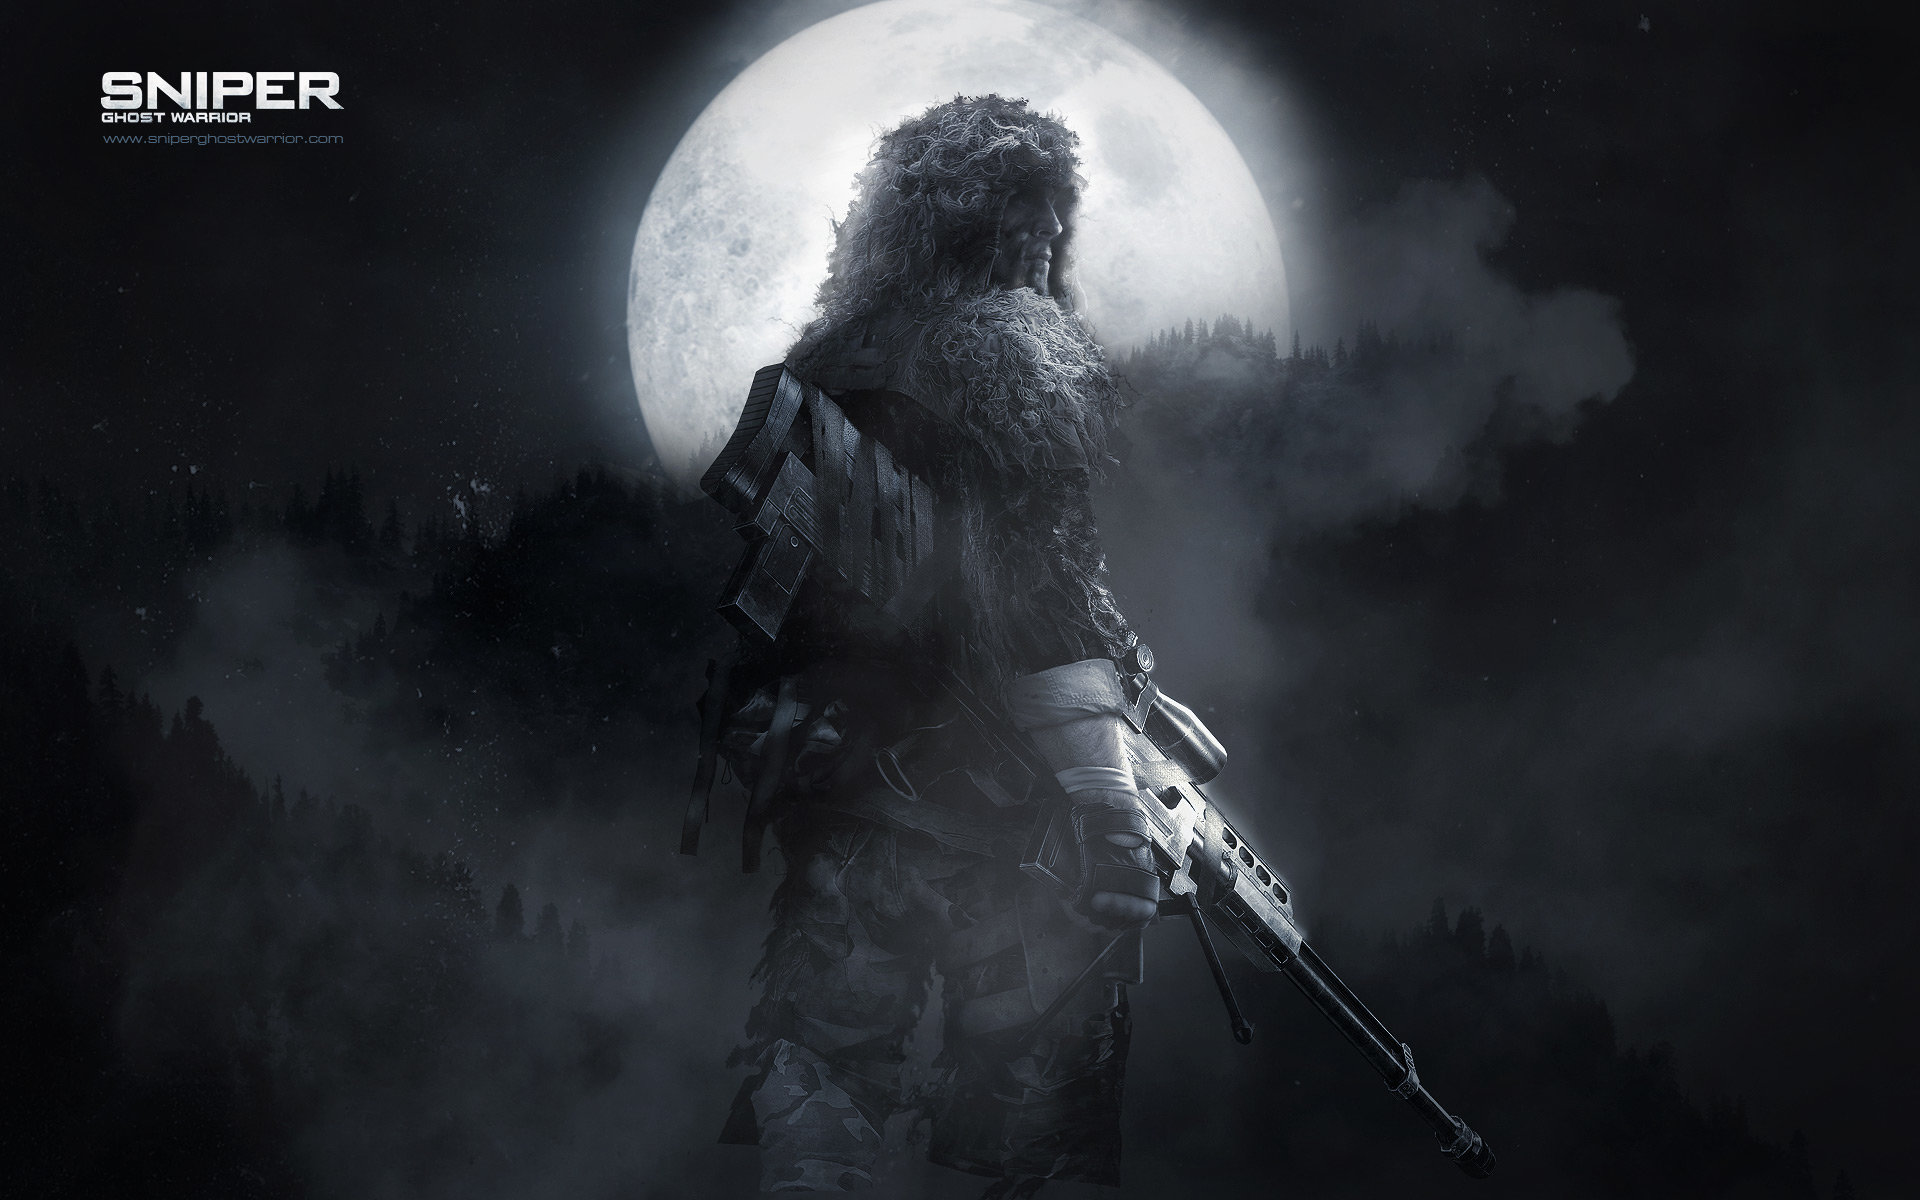 sniper: ghost warrior wallpapers hd for desktop backgrounds